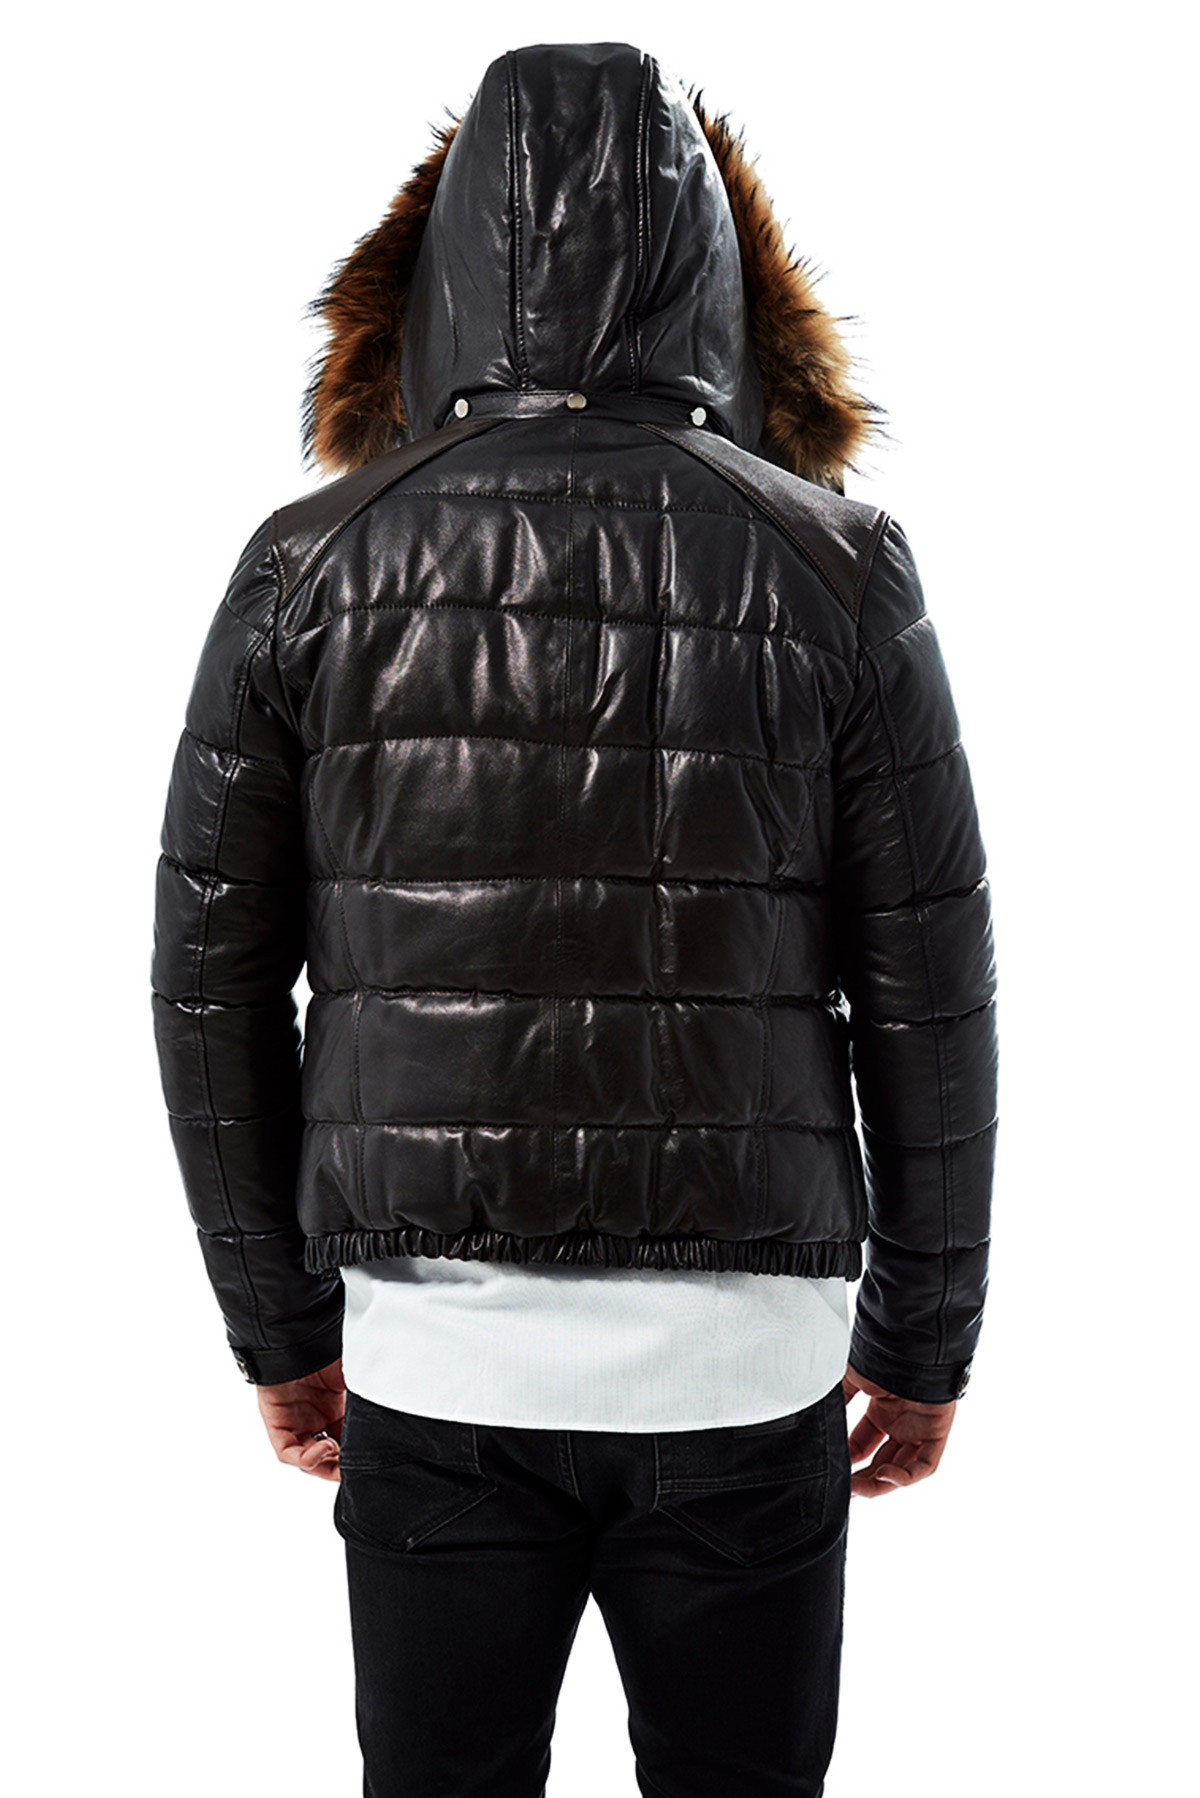 genuine leather jacket mens with hood